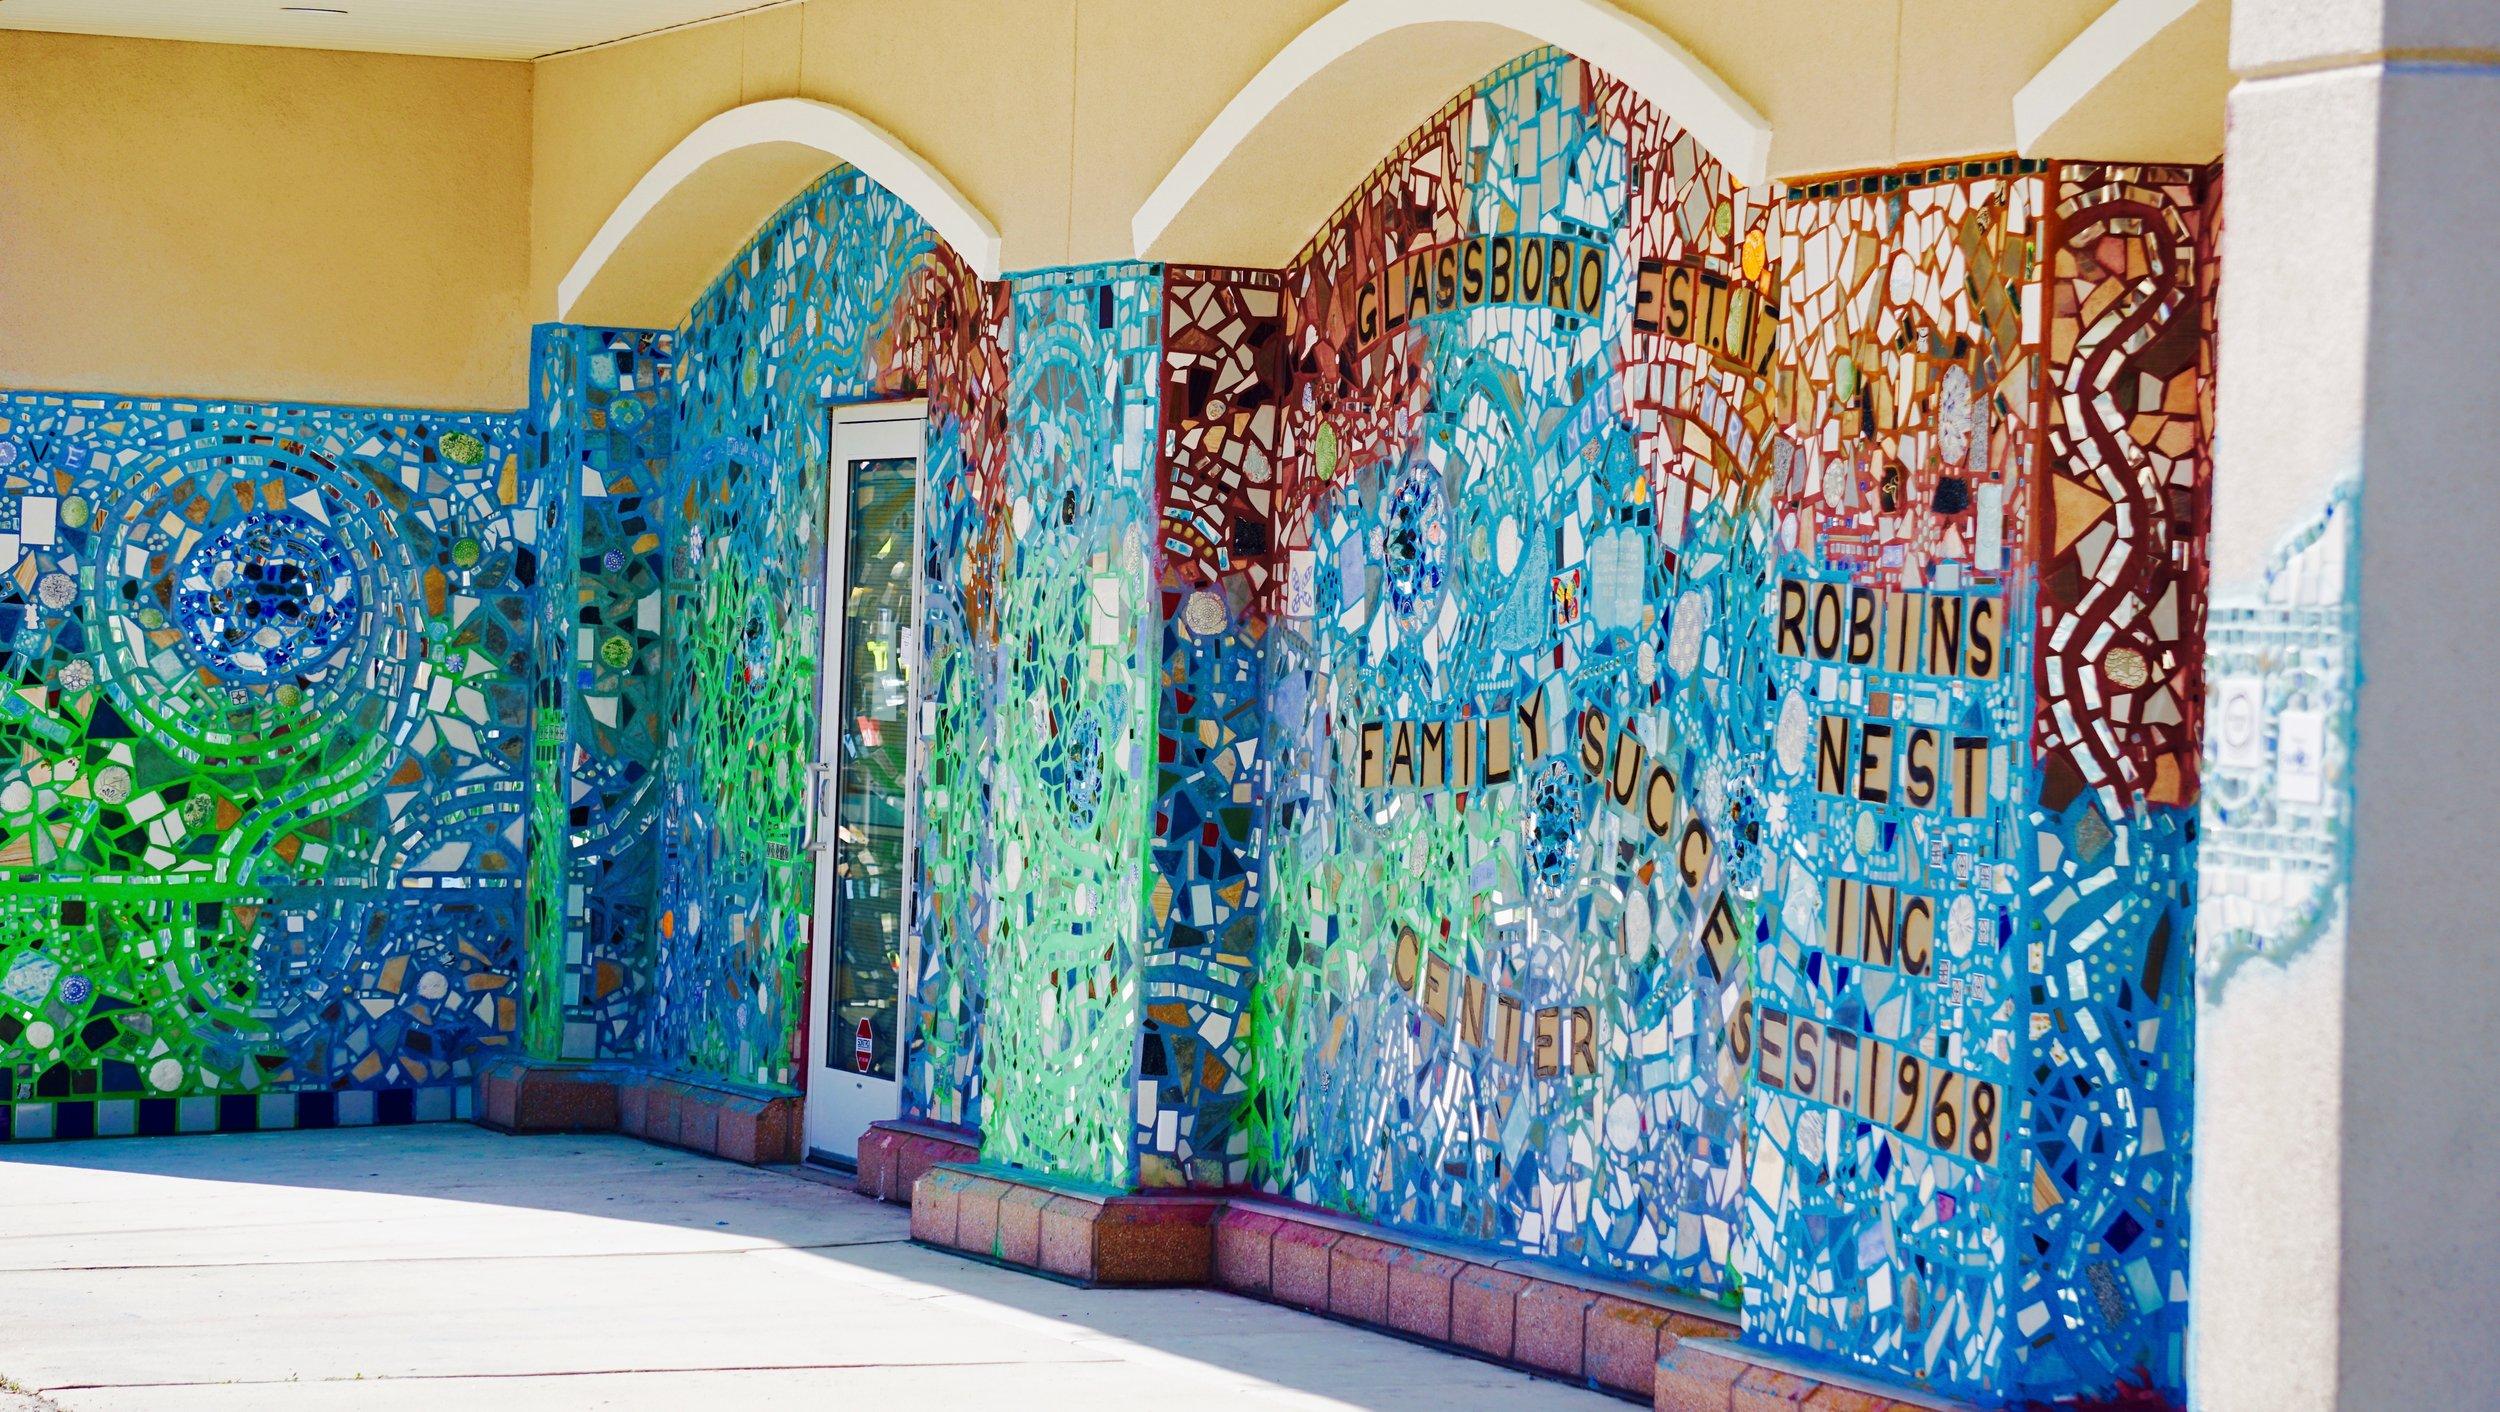 Isaiah Zagar Mosaic Mural for glassboro14.jpg